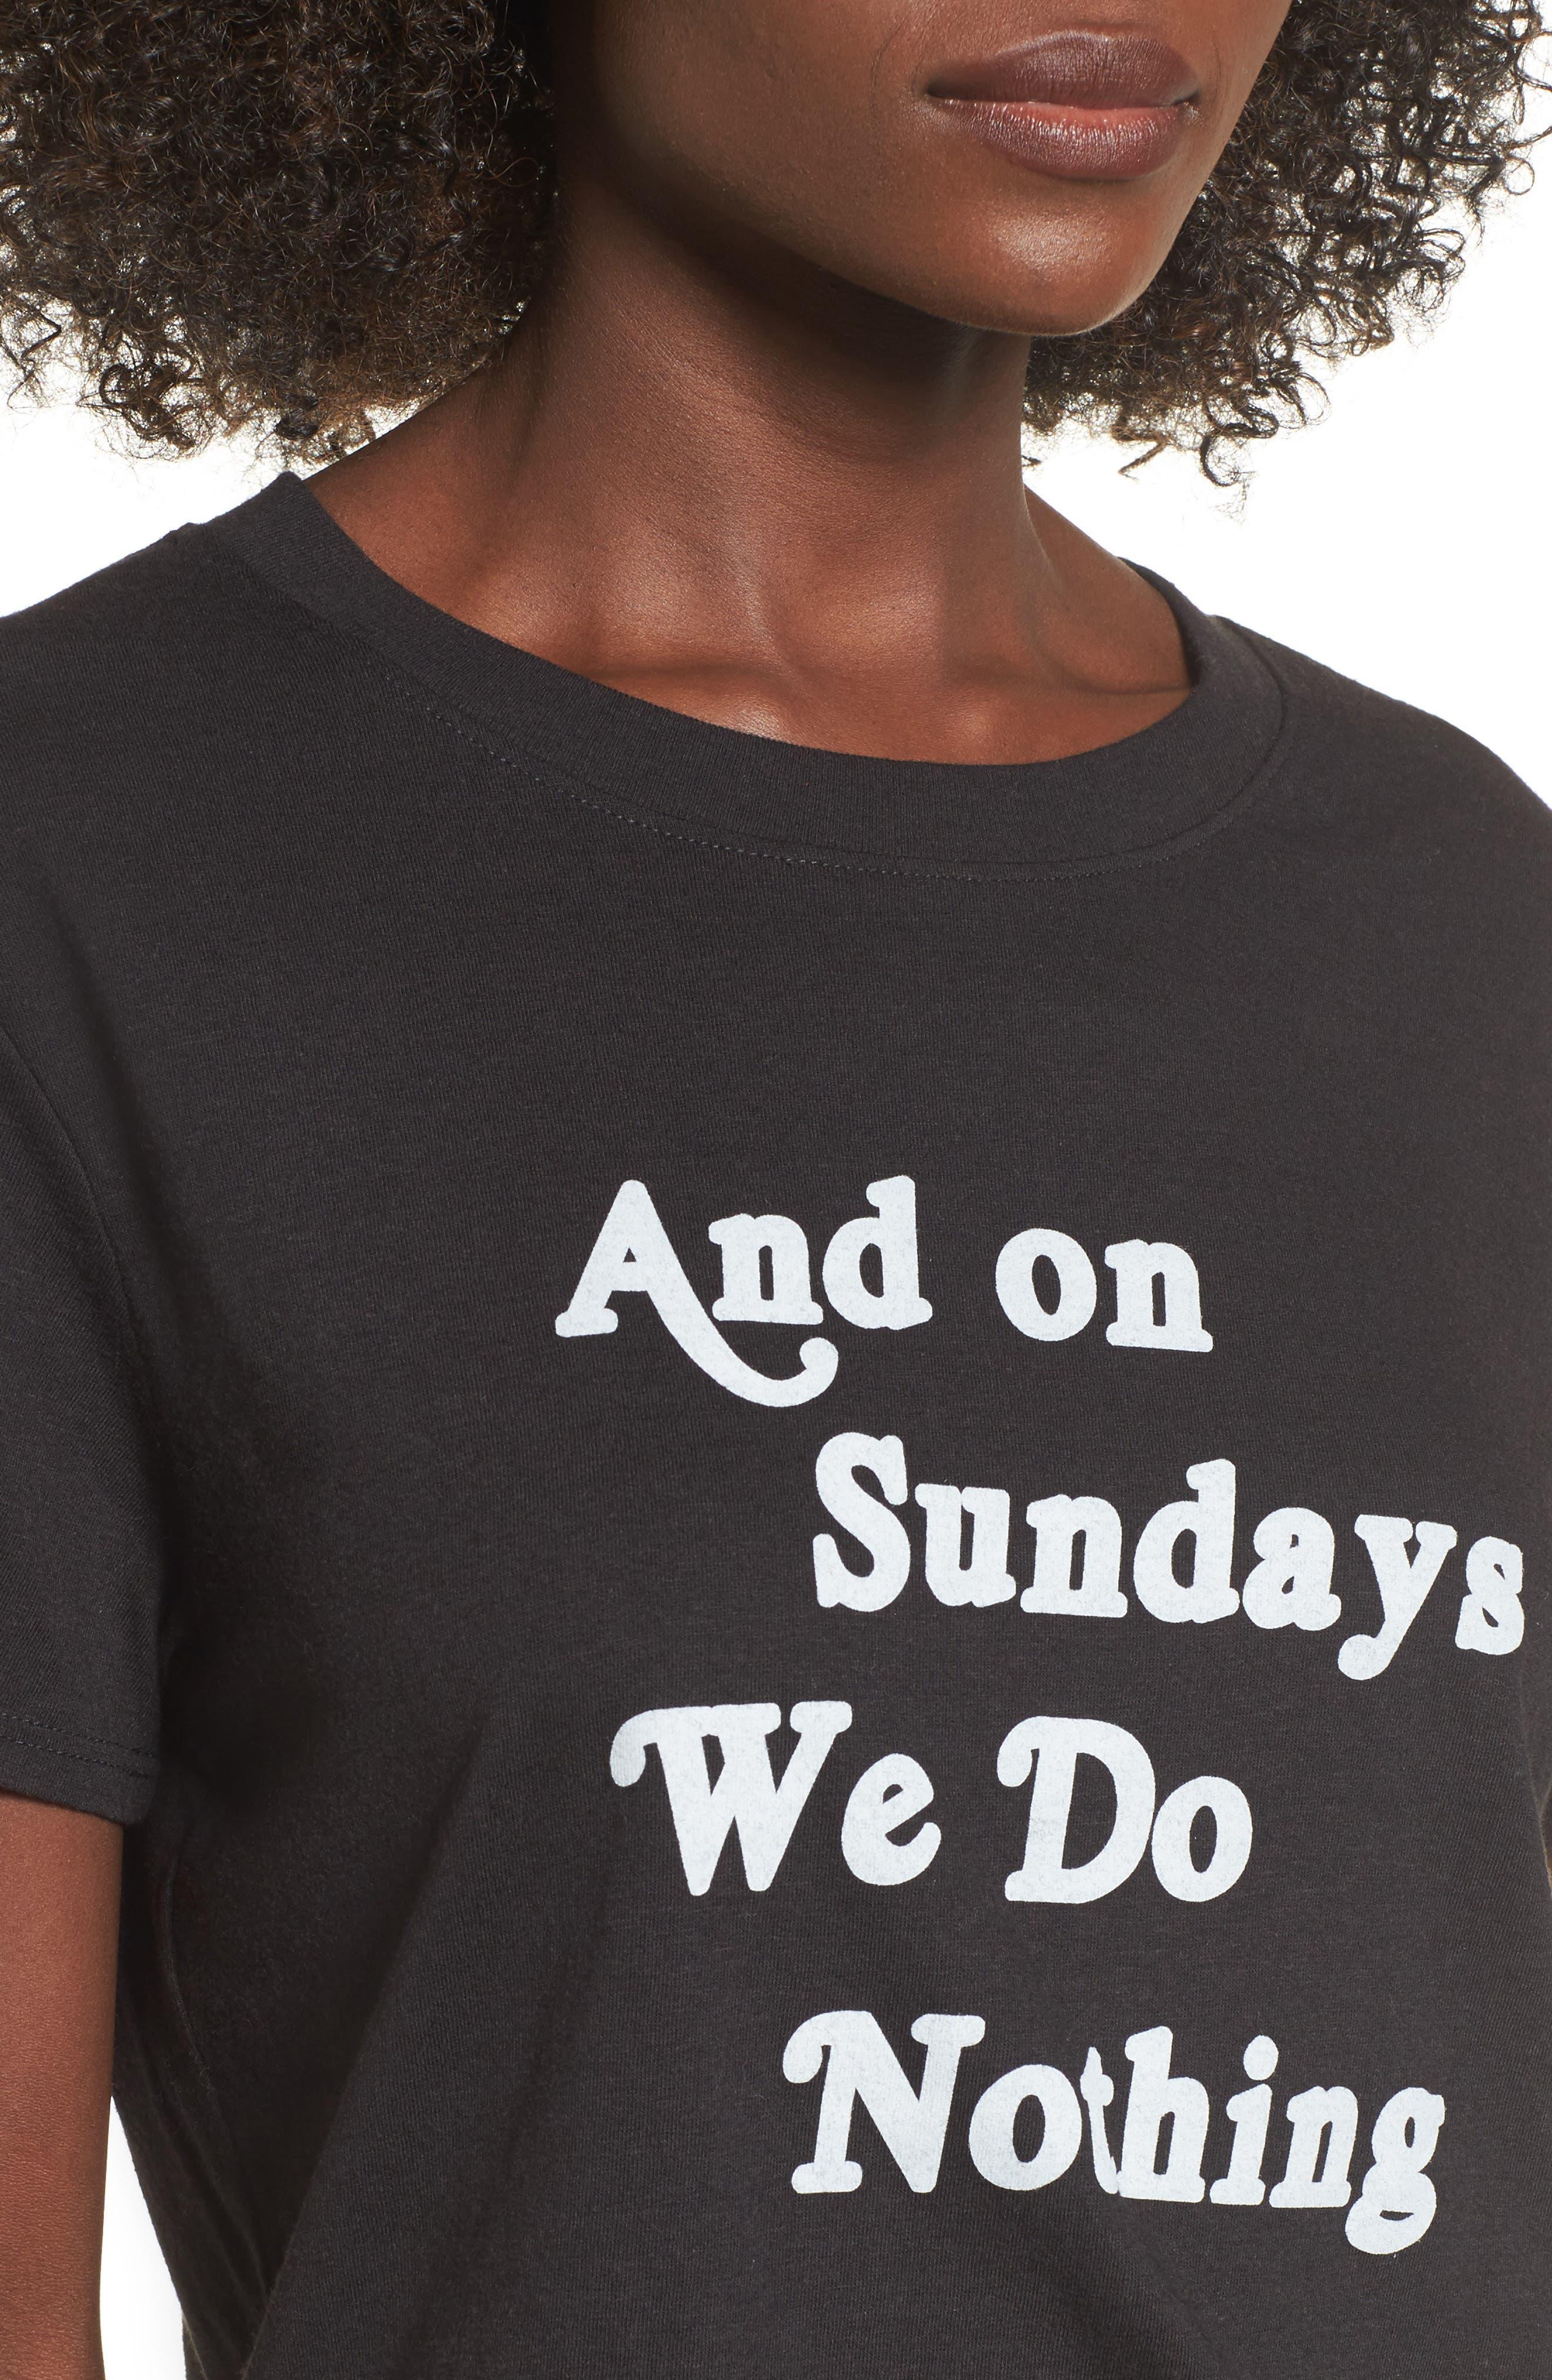 On Sundays Graphic Tee,                             Alternate thumbnail 4, color,                             Black